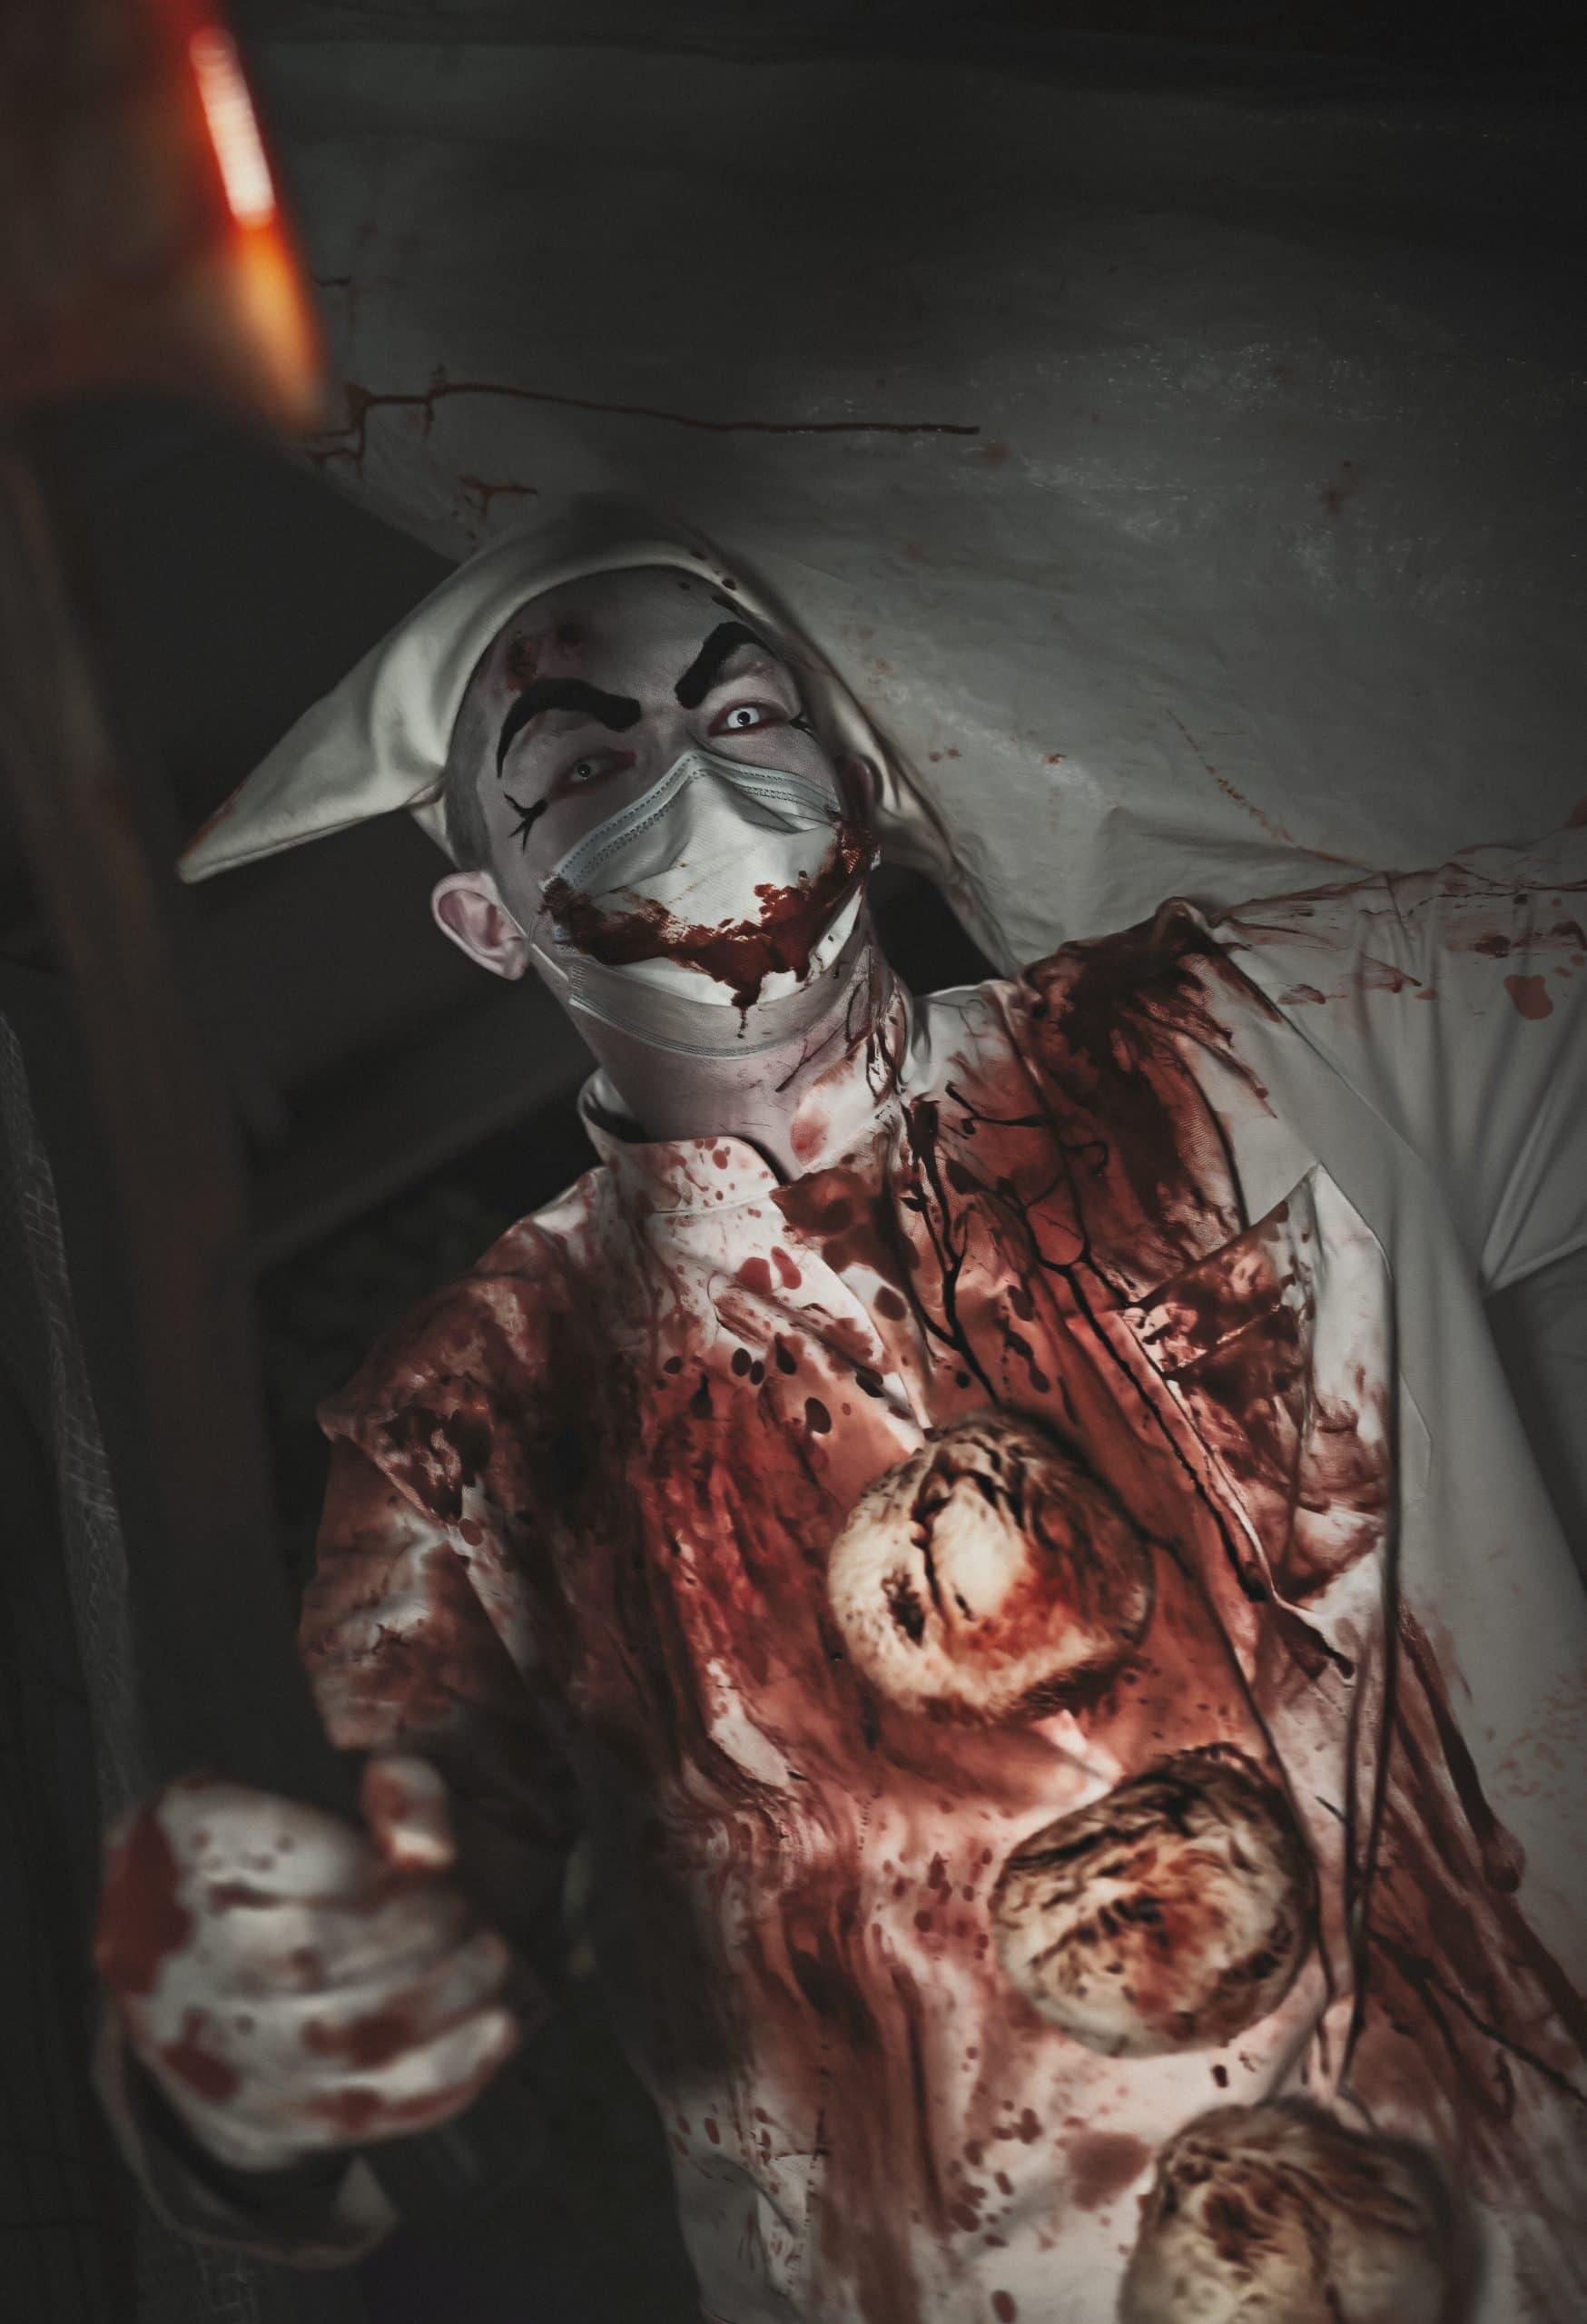 Øksemorderen Pjerrot Halloween Tivoli Friheden Det Hjemsøgte Hotel